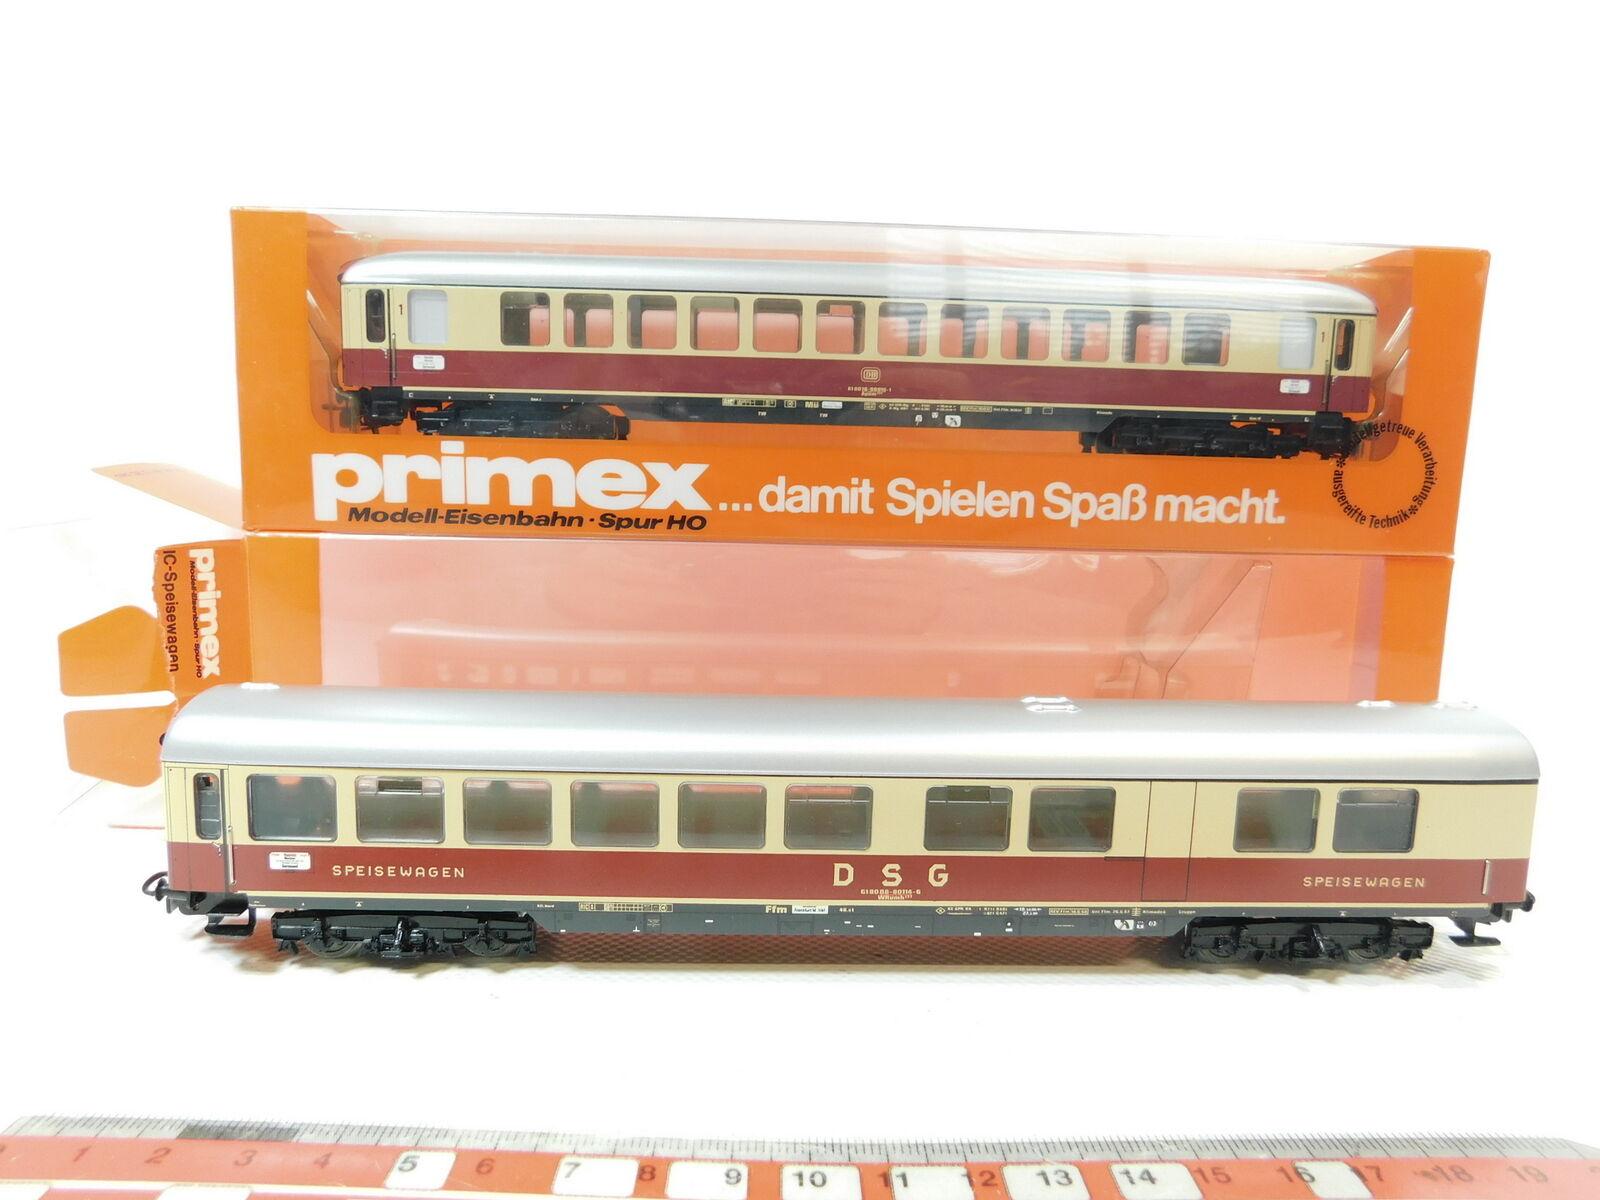 Bg141-1 X Primex Märklin H0 AC blech-ic-speisewagen etc.   4288 DB +4289 DSG